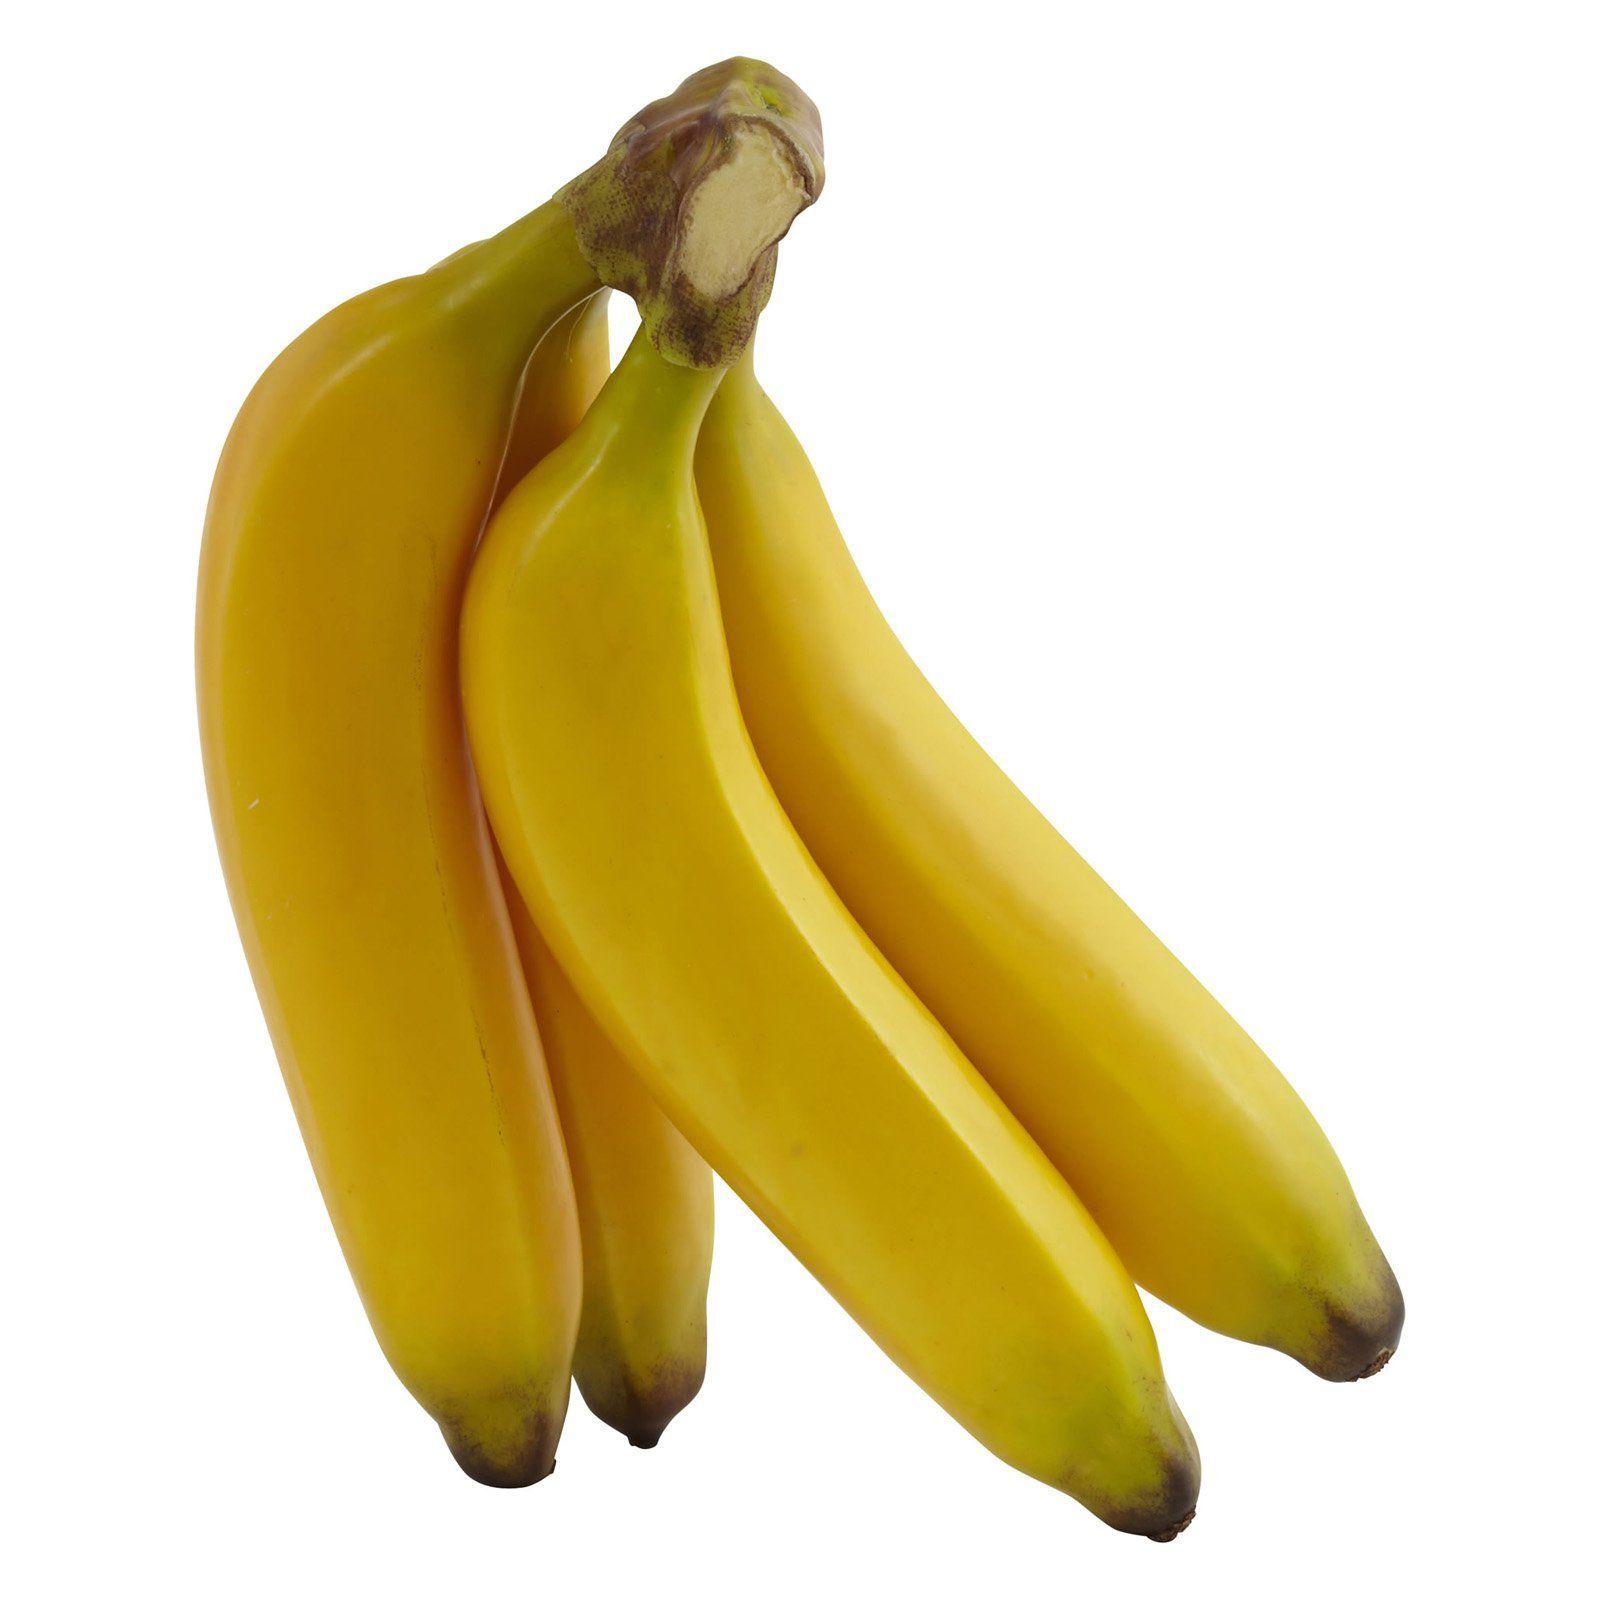 Nearly Natural Banana Bunch - Set of 4 - 2191-S4